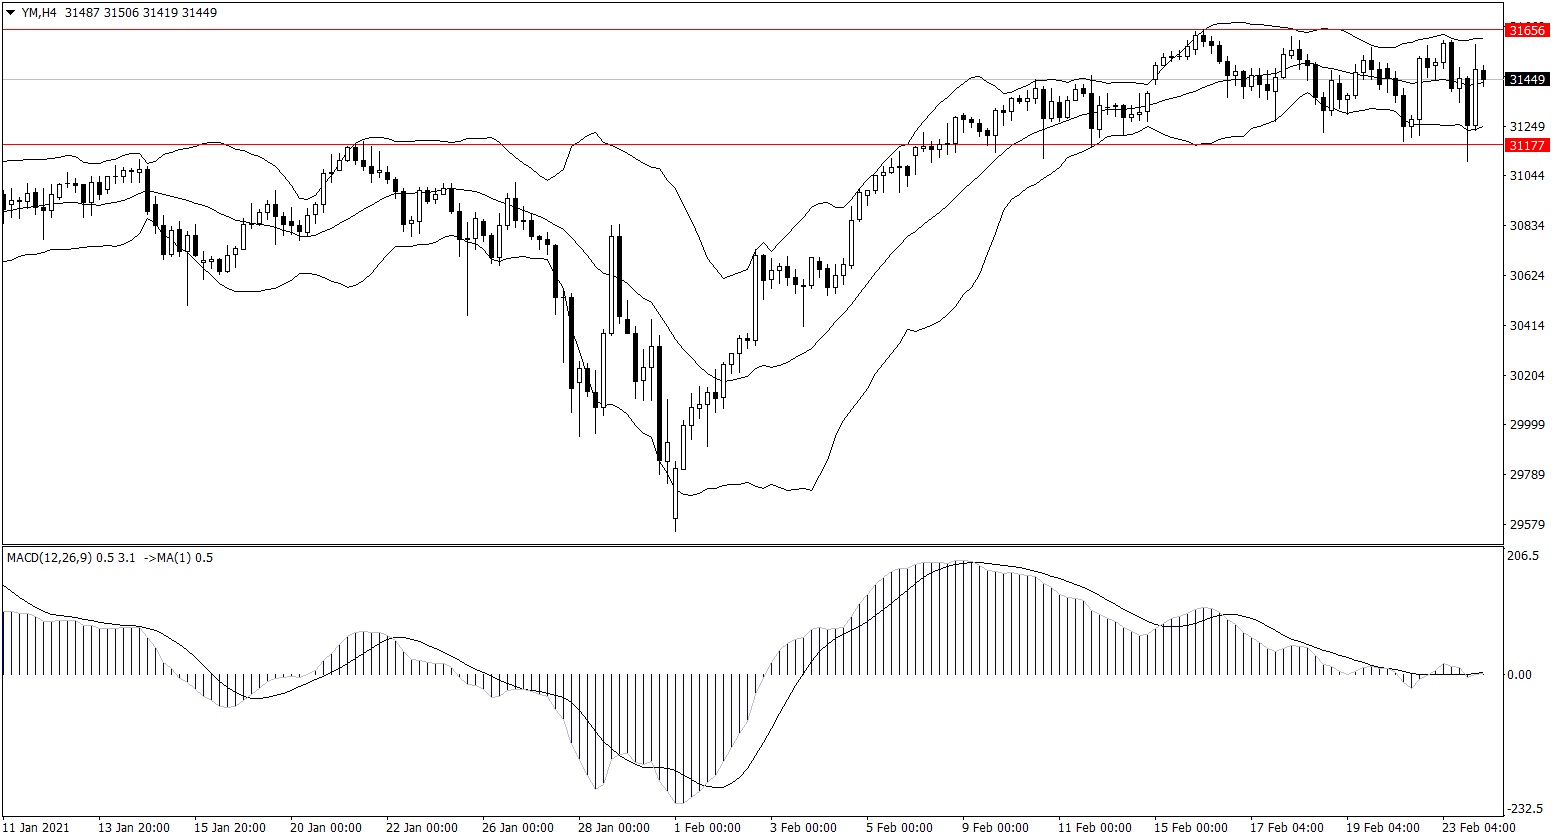 ForexClub福瑞斯股市分析 0224